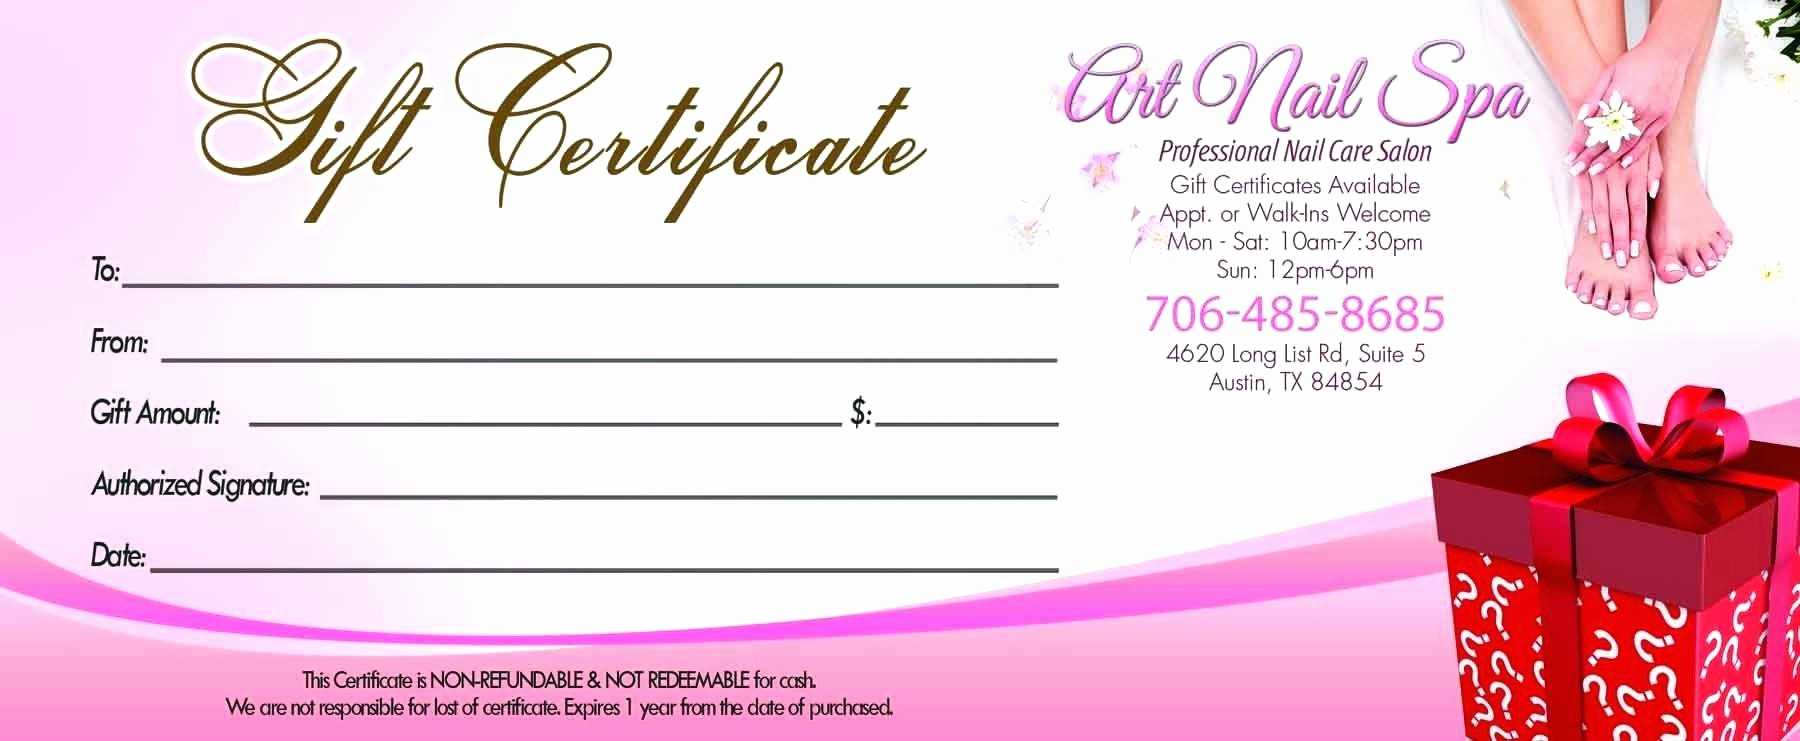 Free Printable Hair Salon Gift Certificate Template | Mult with Nail Gift Certificate Template Free